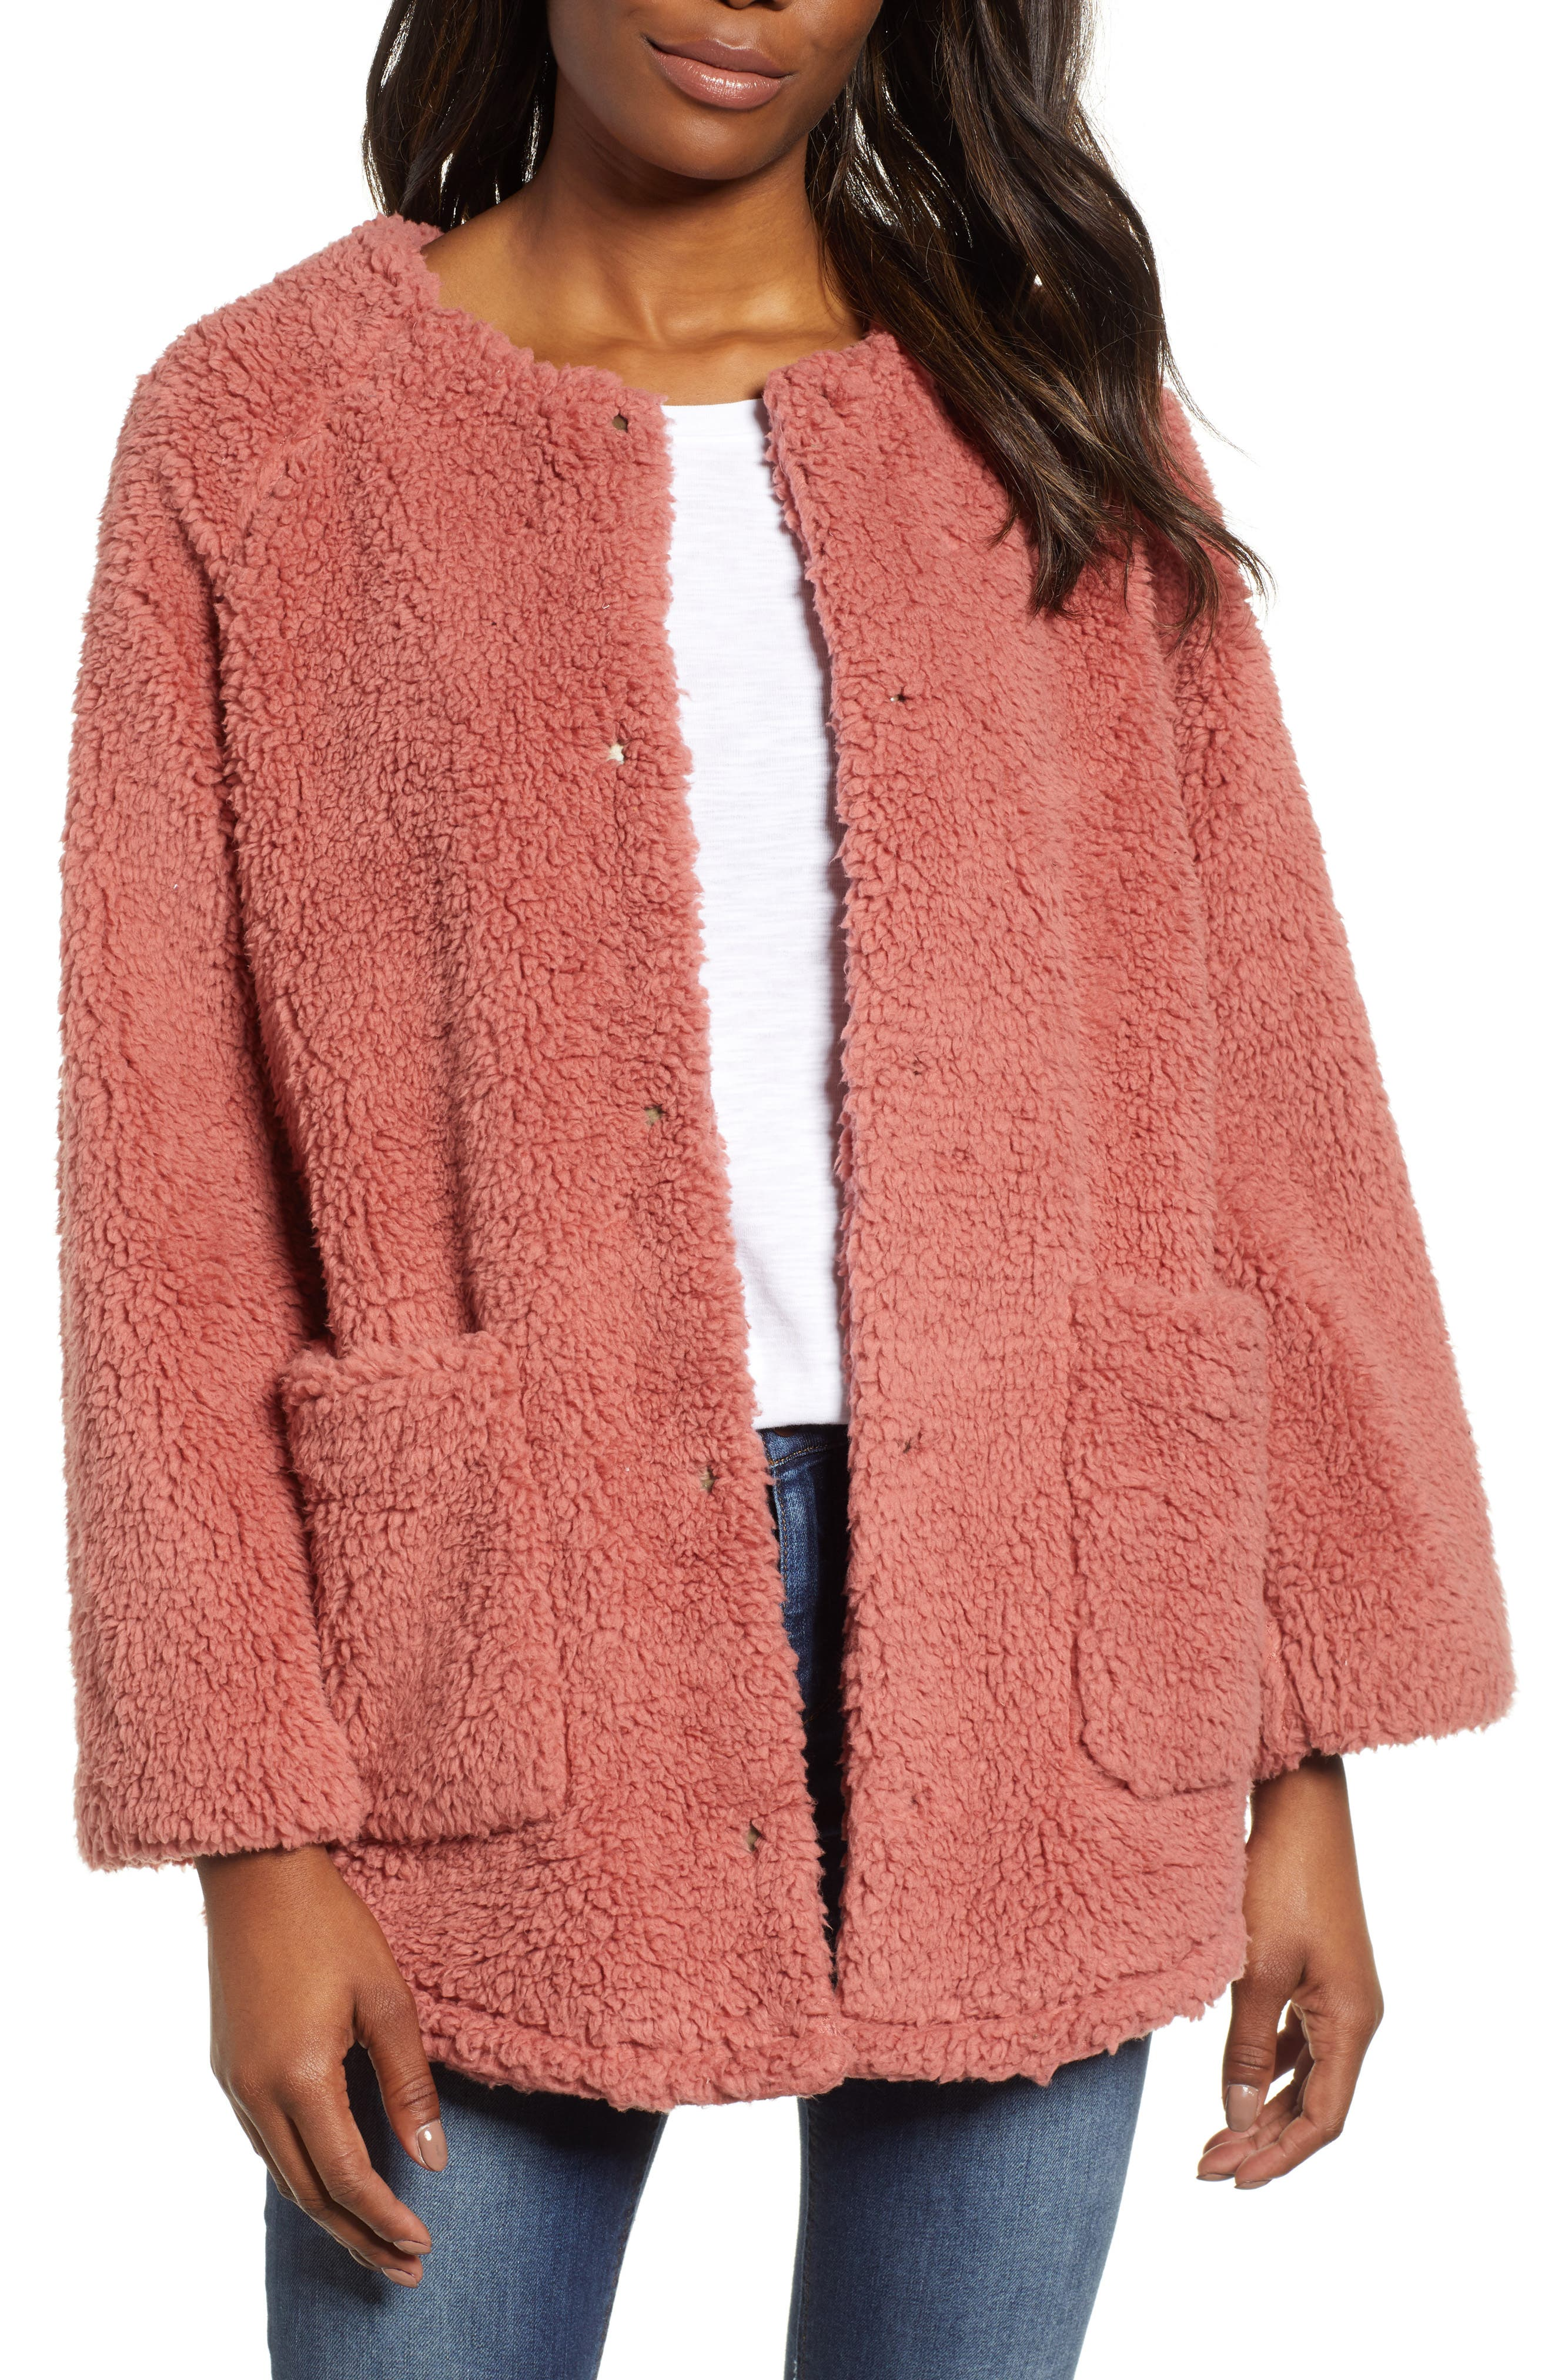 Fuzzy Fleece Jacket,                             Main thumbnail 1, color,                             650